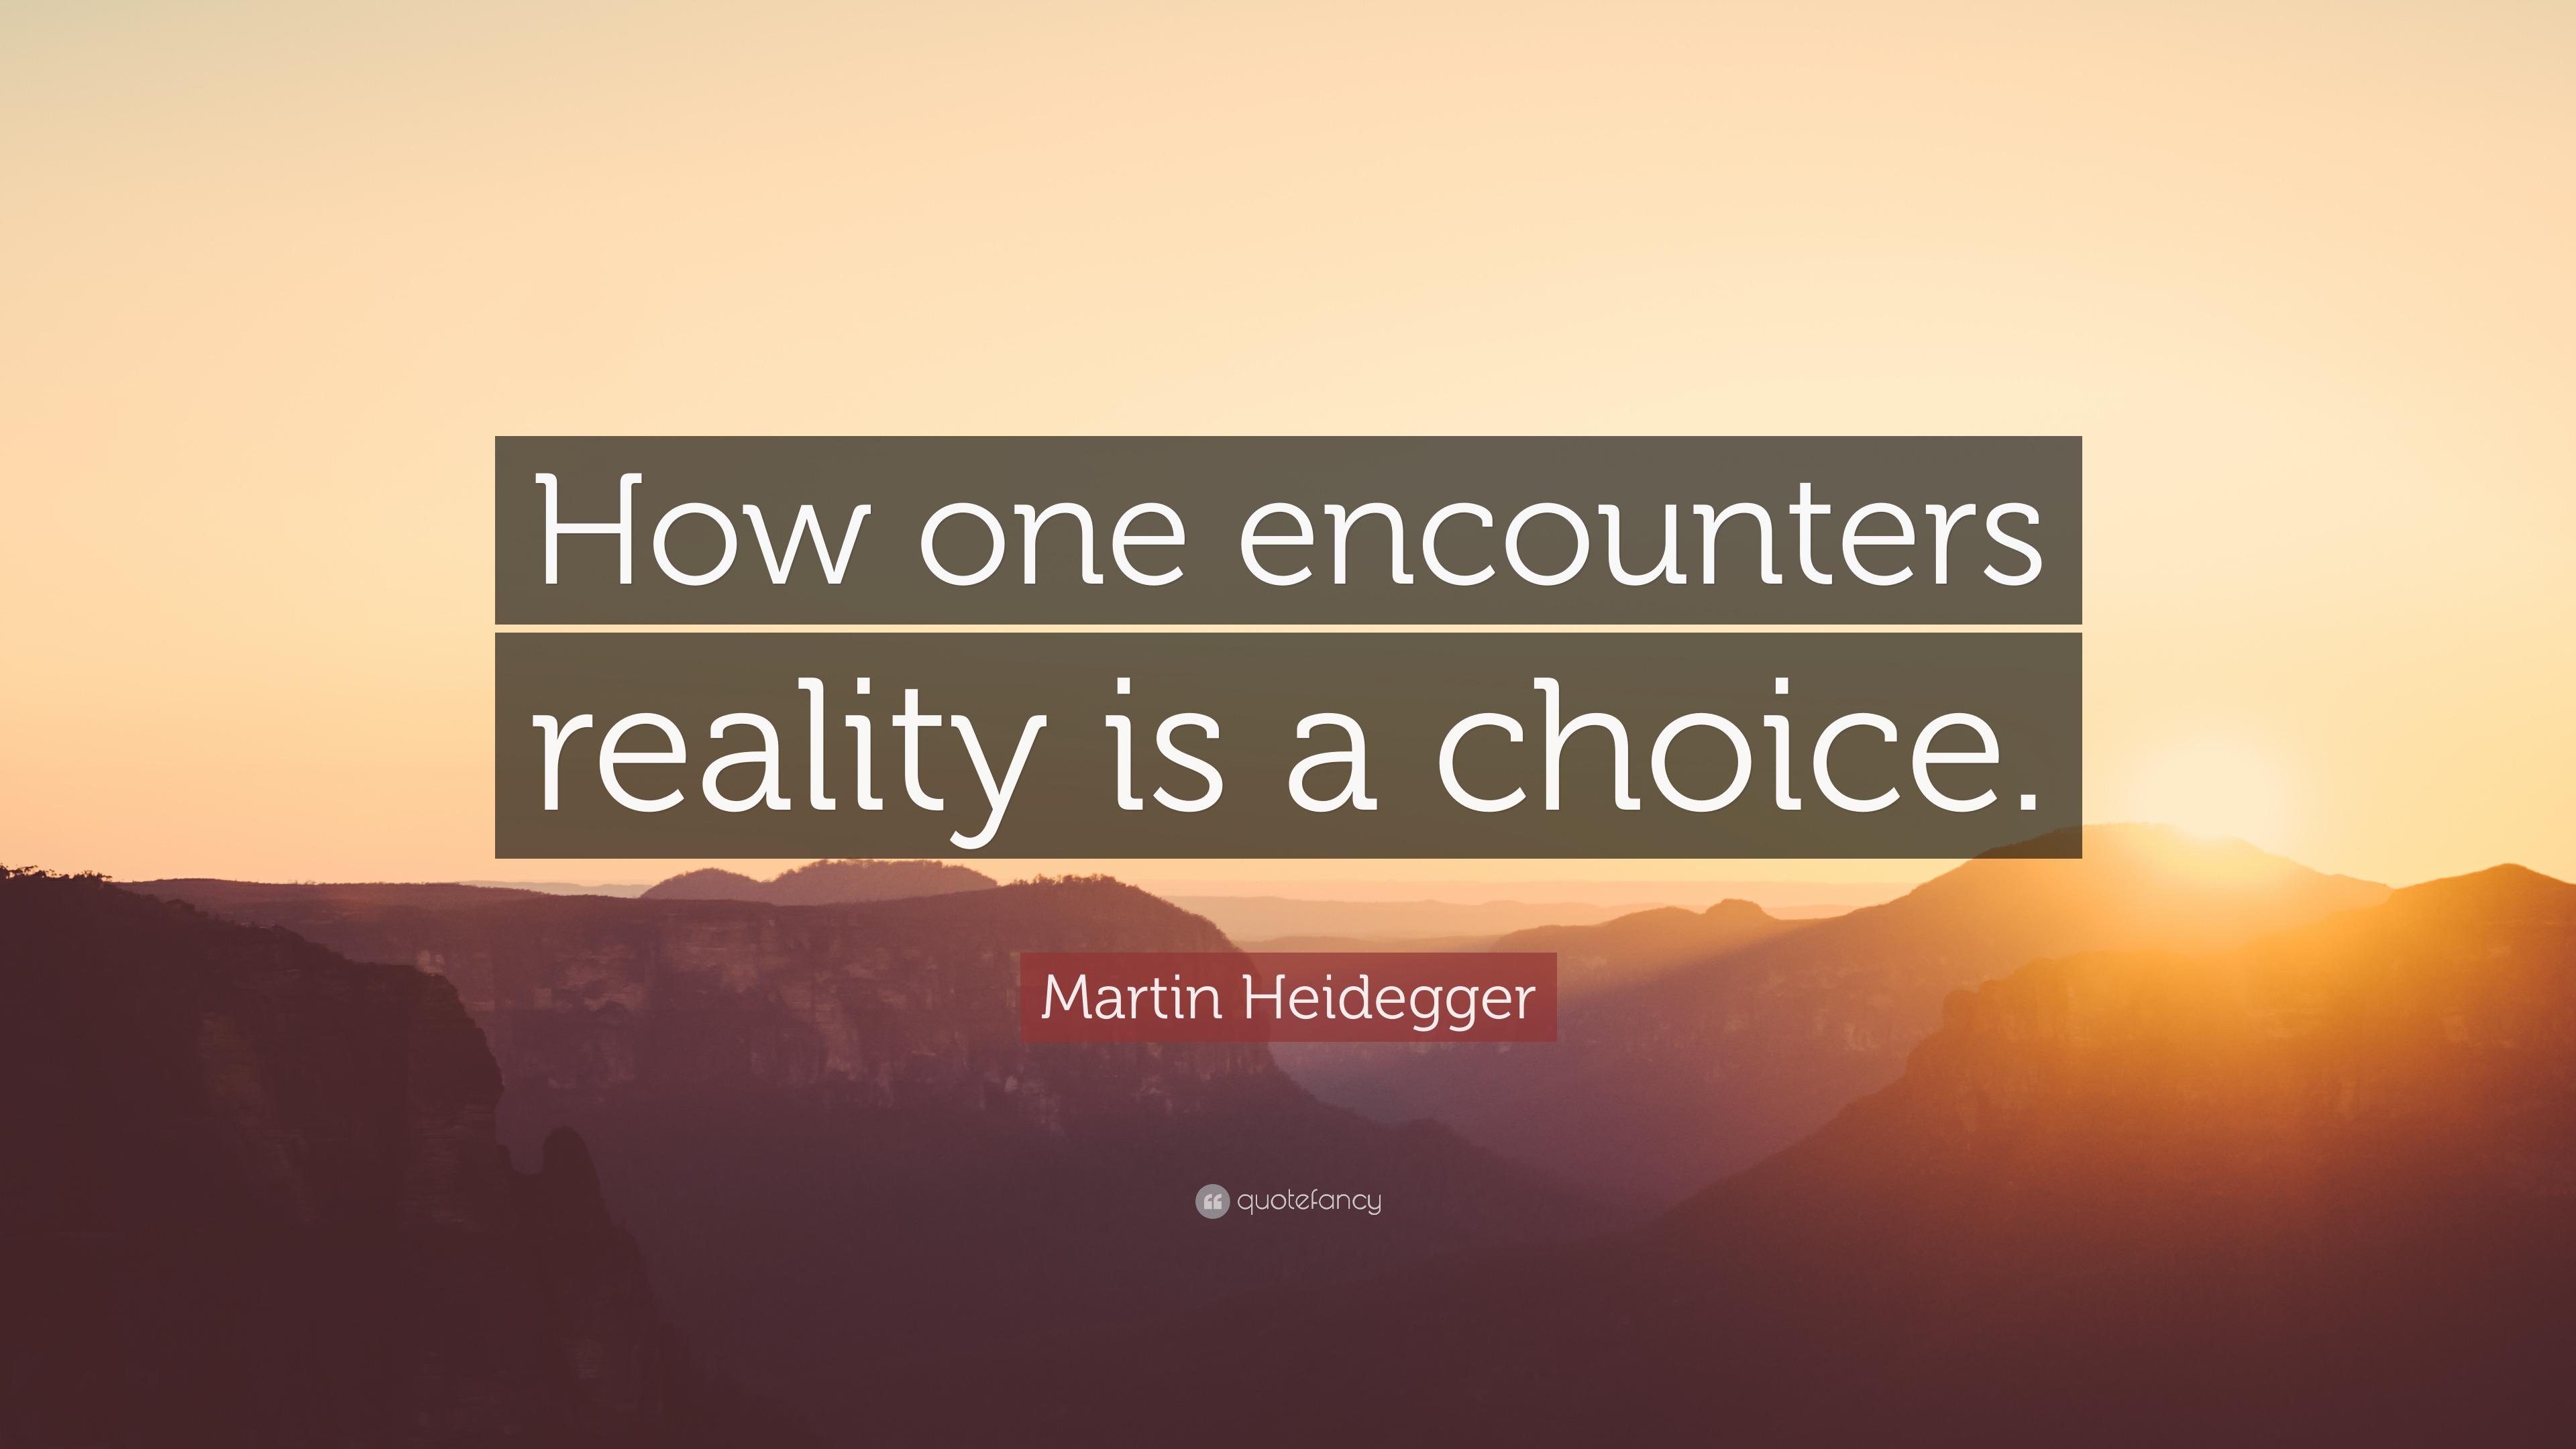 martin heidegger quotes on life